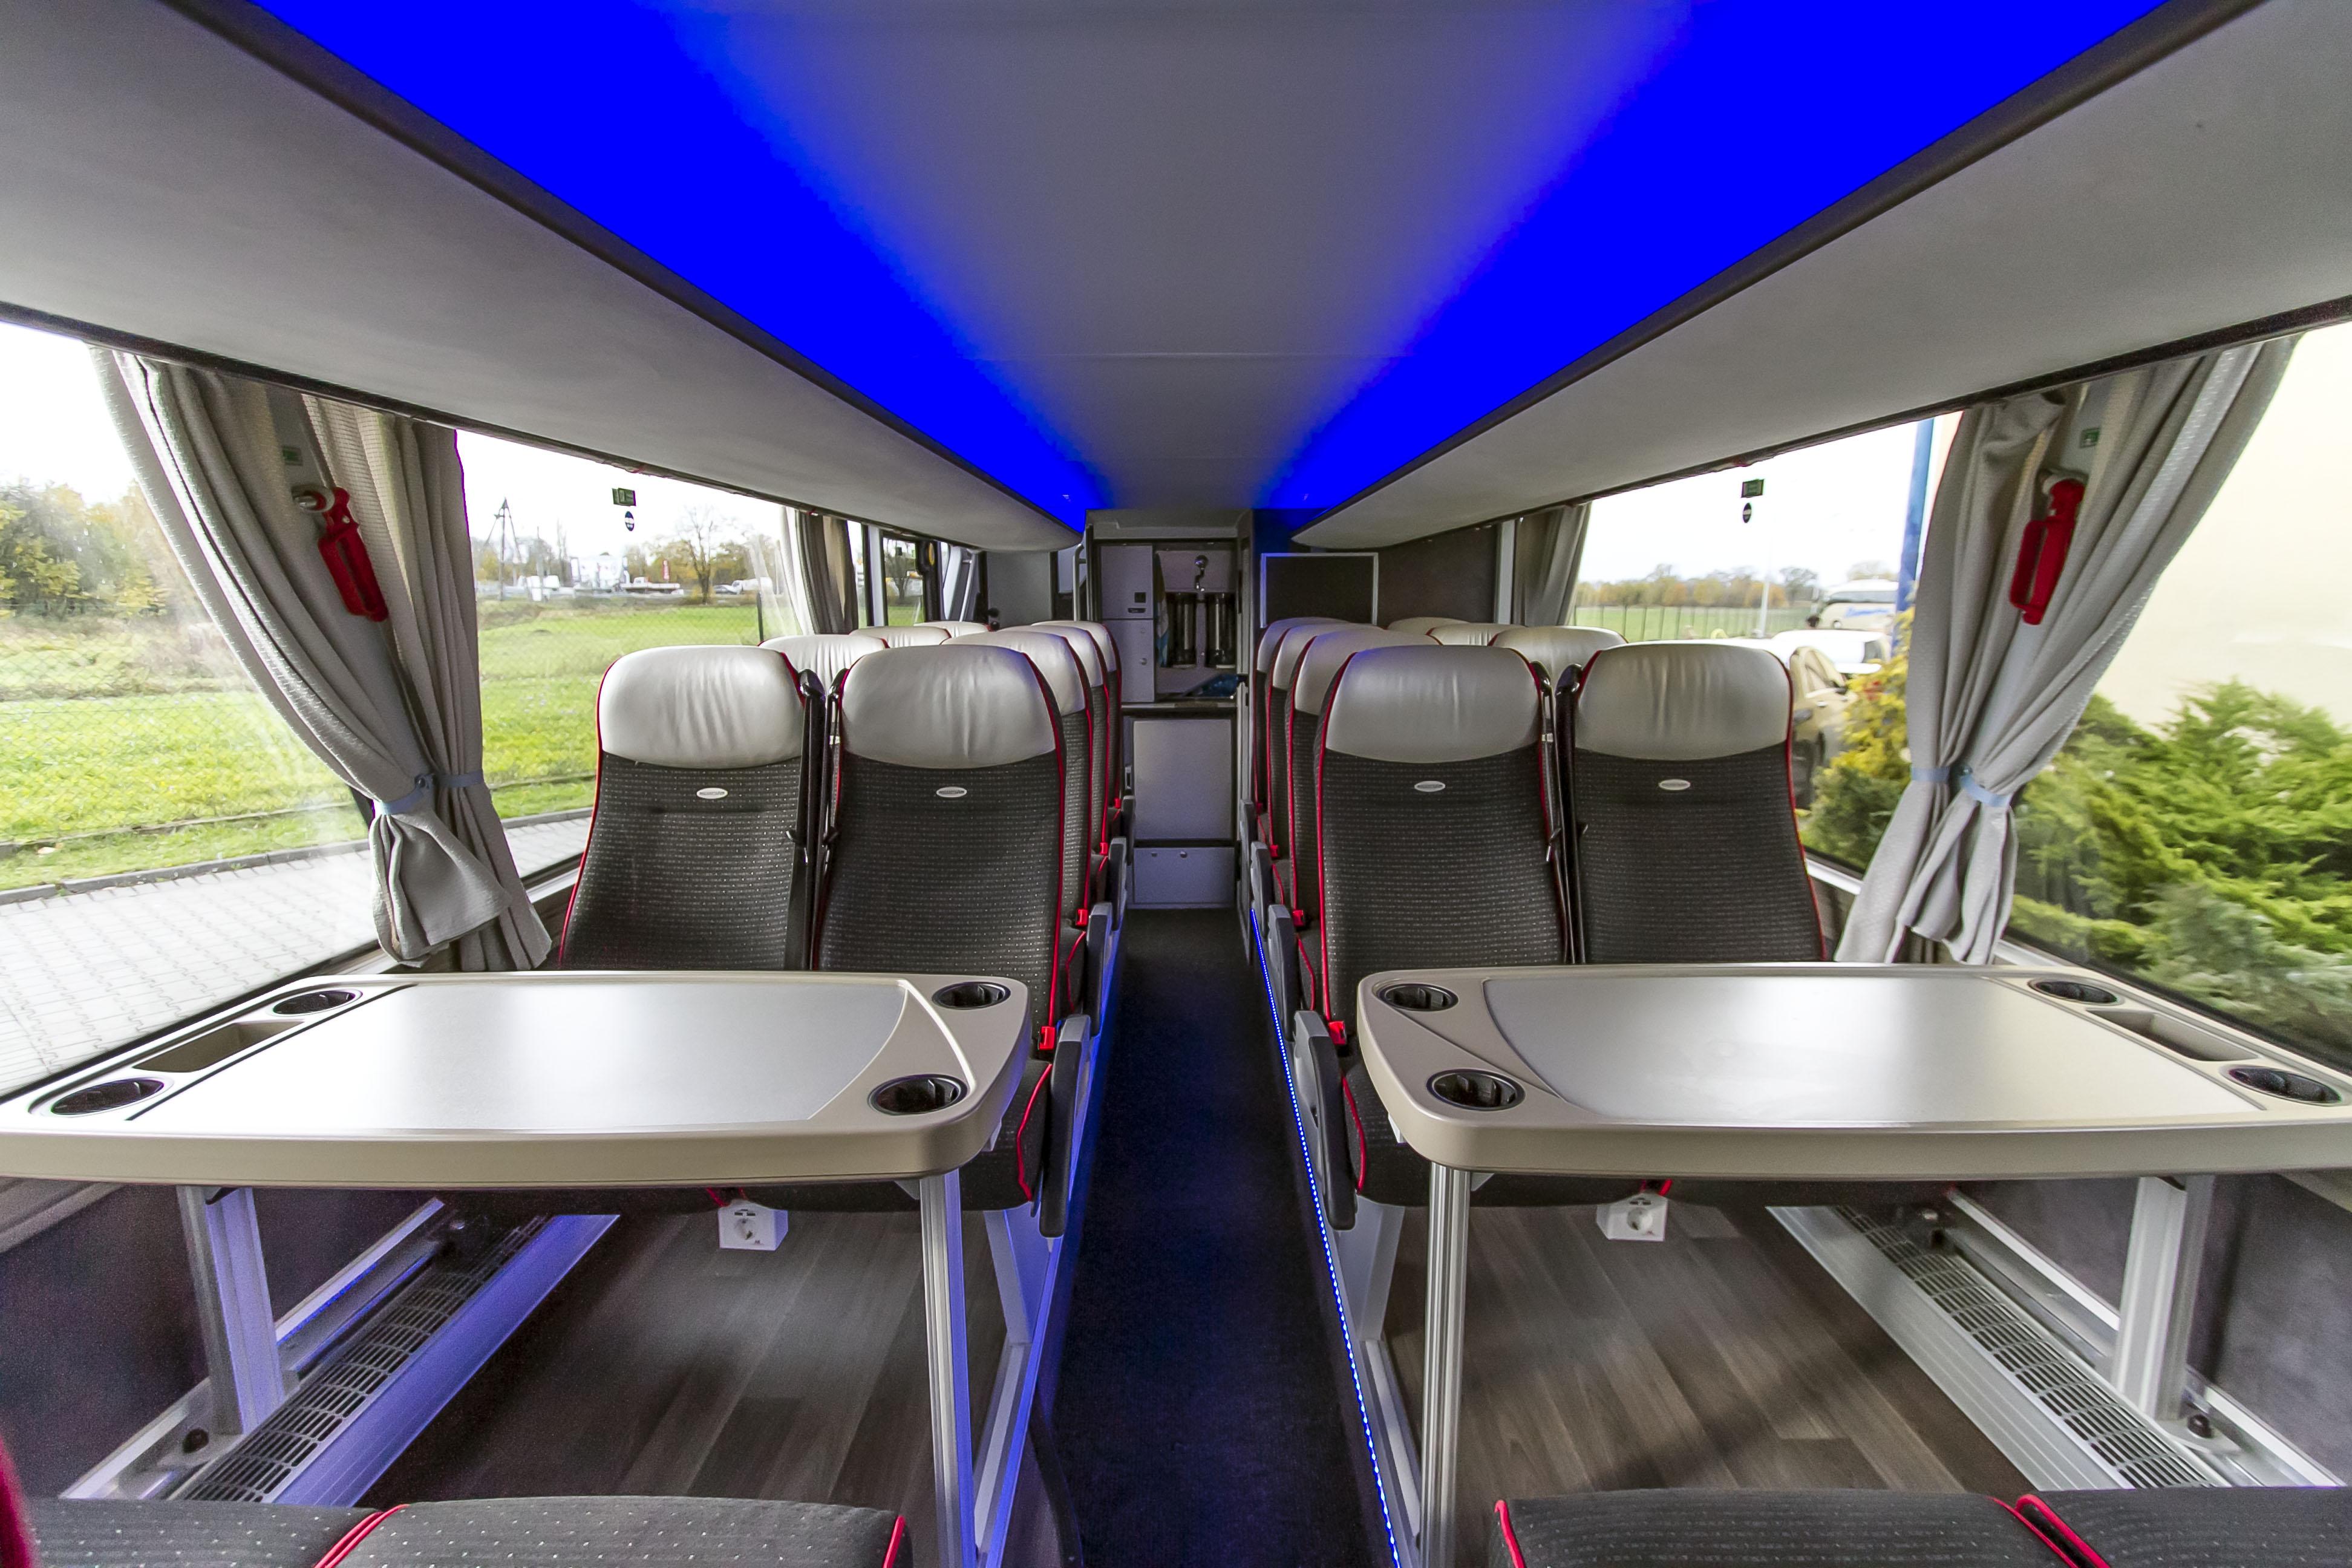 Wnętrze luksusowego autobusu_led_Bomatur